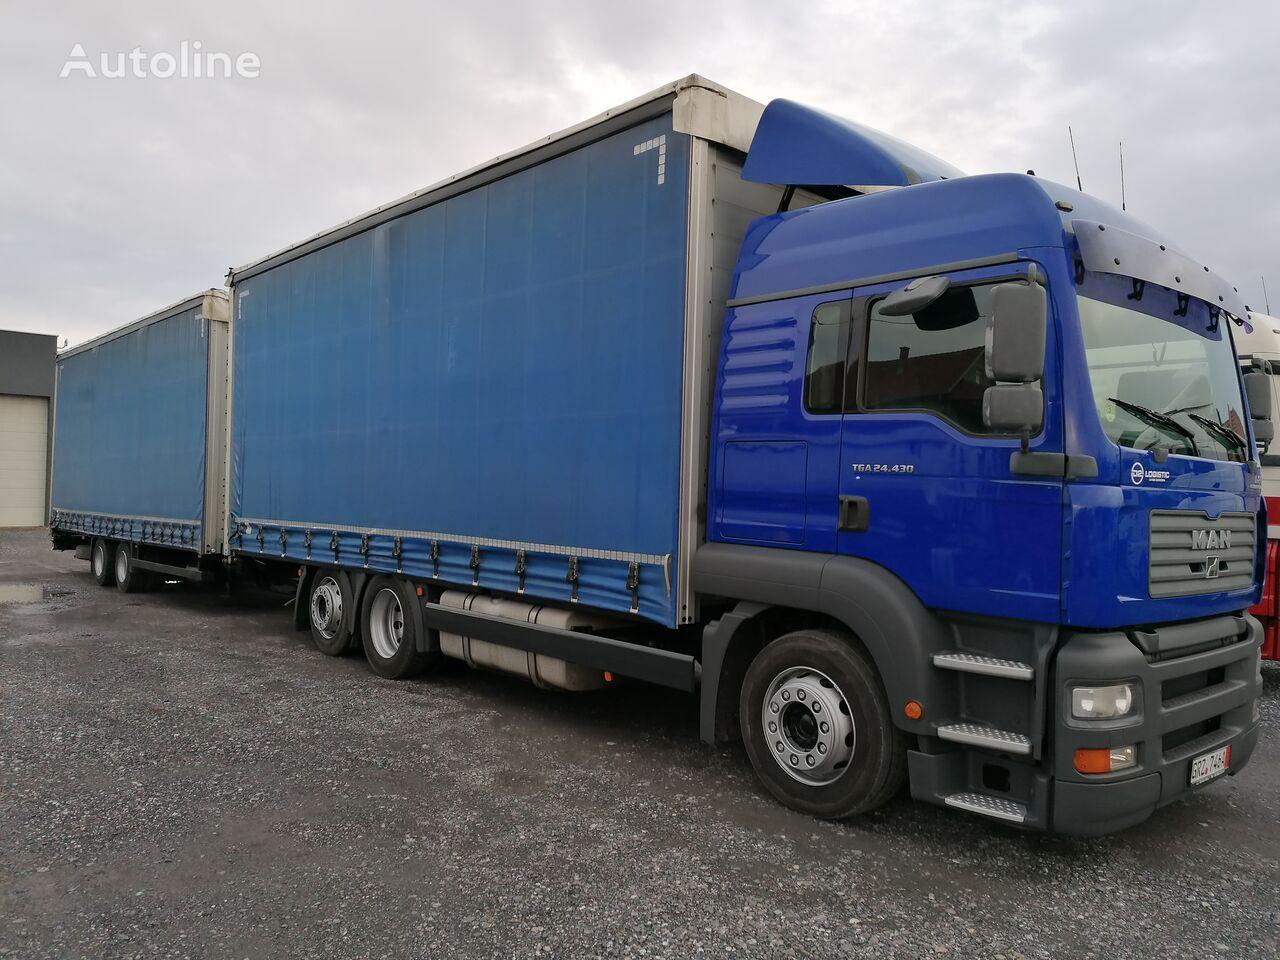 MAN TGA 24.430 camión toldo + remolque toldo